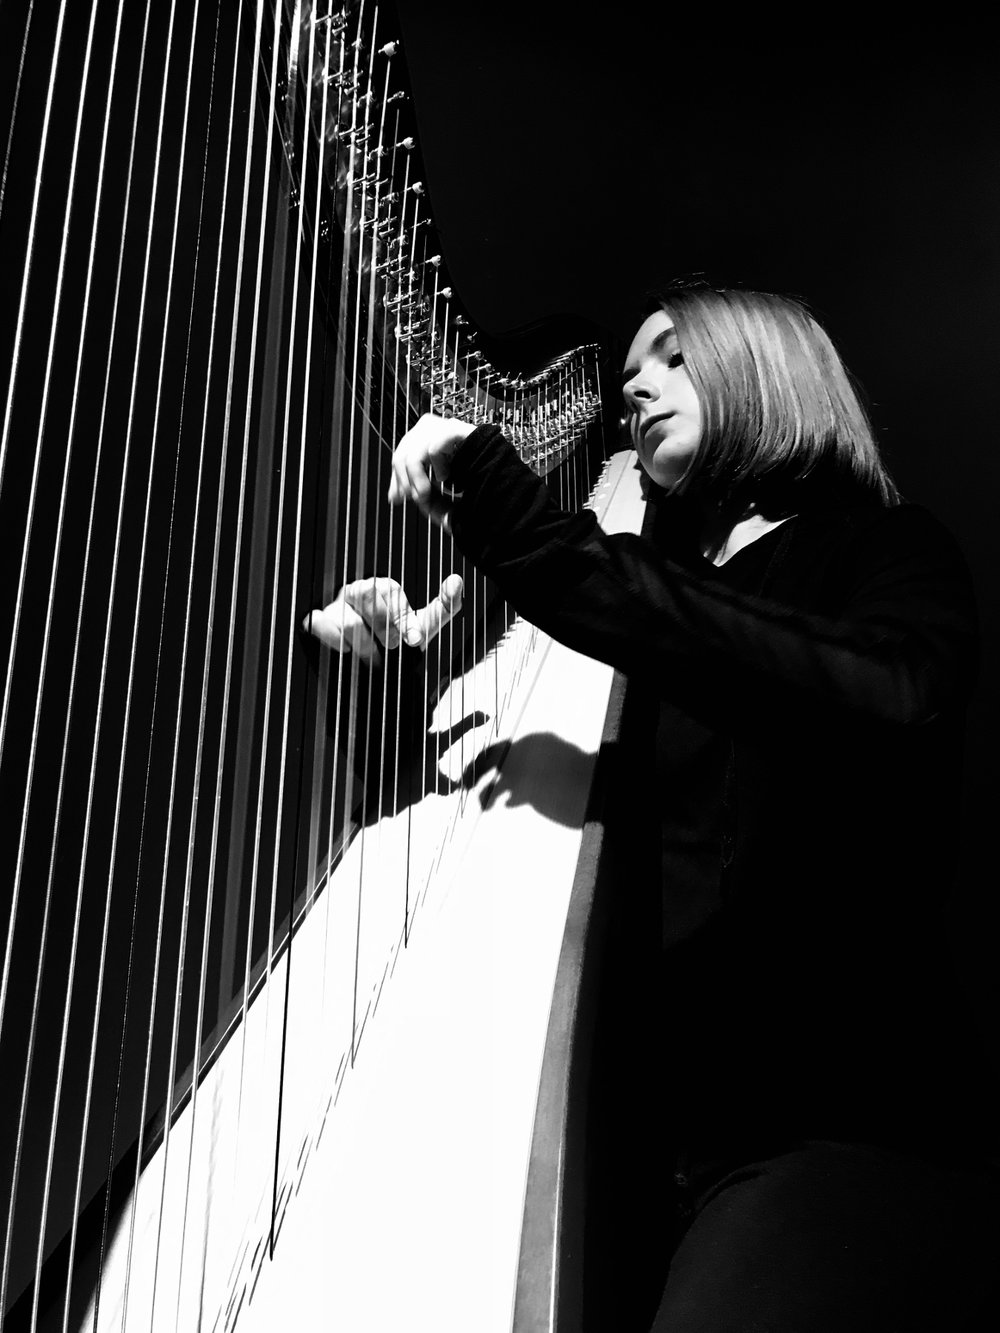 Manuela_Matos_Monteiro_the harpist.jpeg